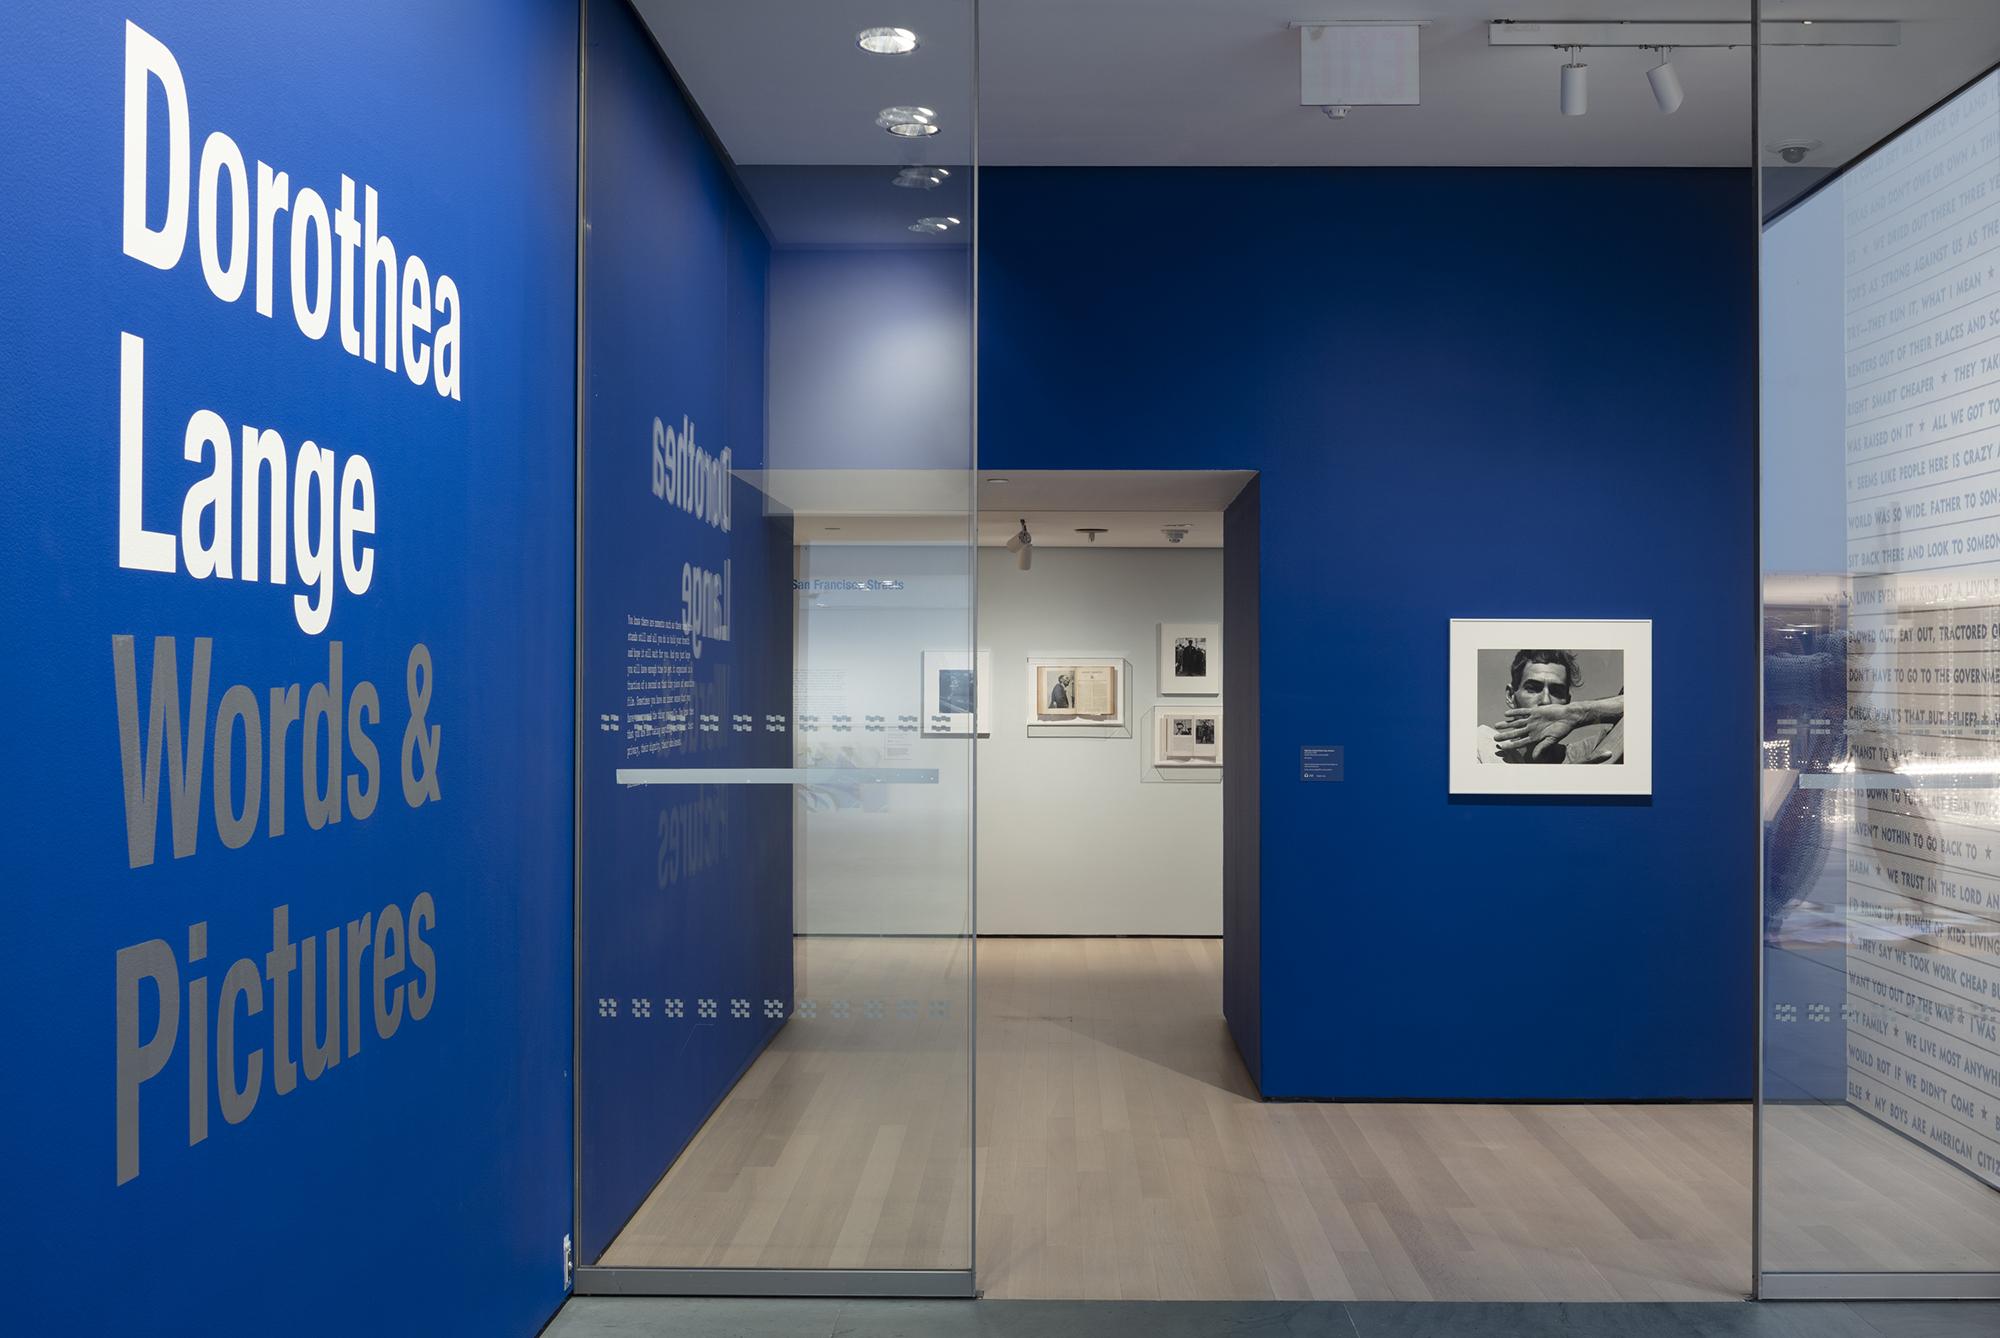 Dorothea Lange: Words & Pictures